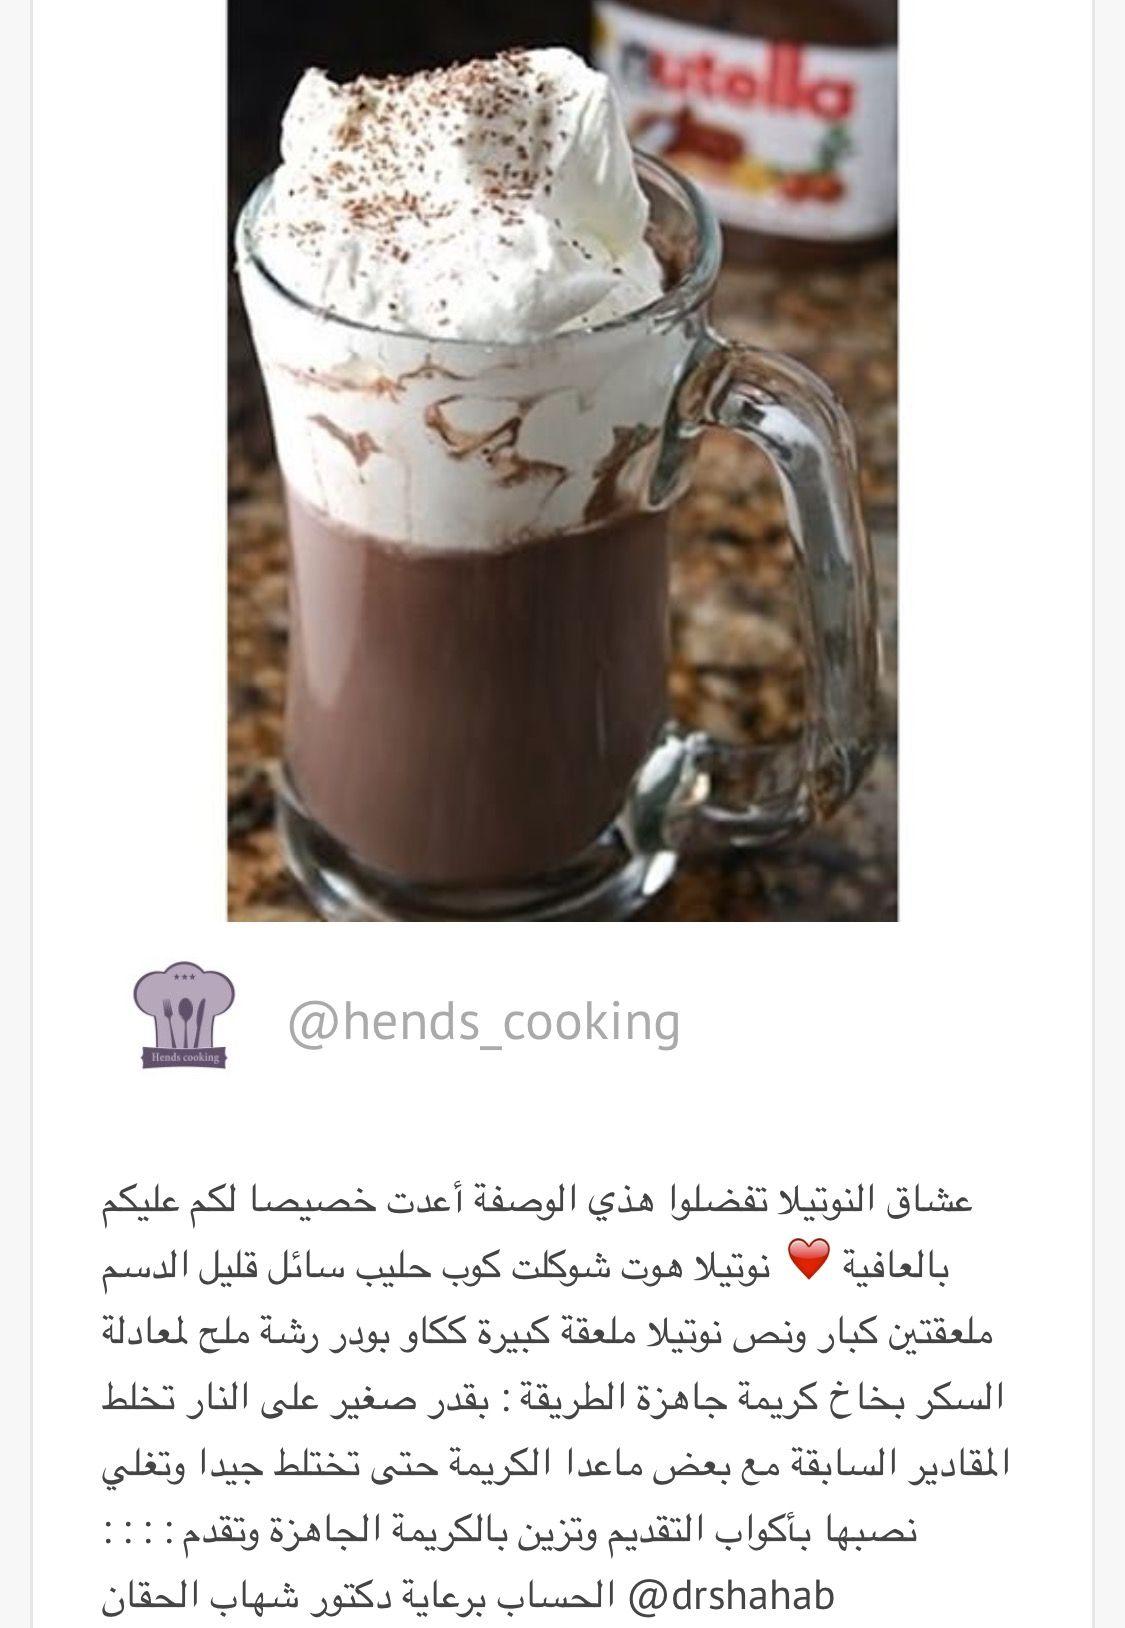 نوتيلا هوت شوكليت Coffee Drinks Banana Crepes Food And Drink